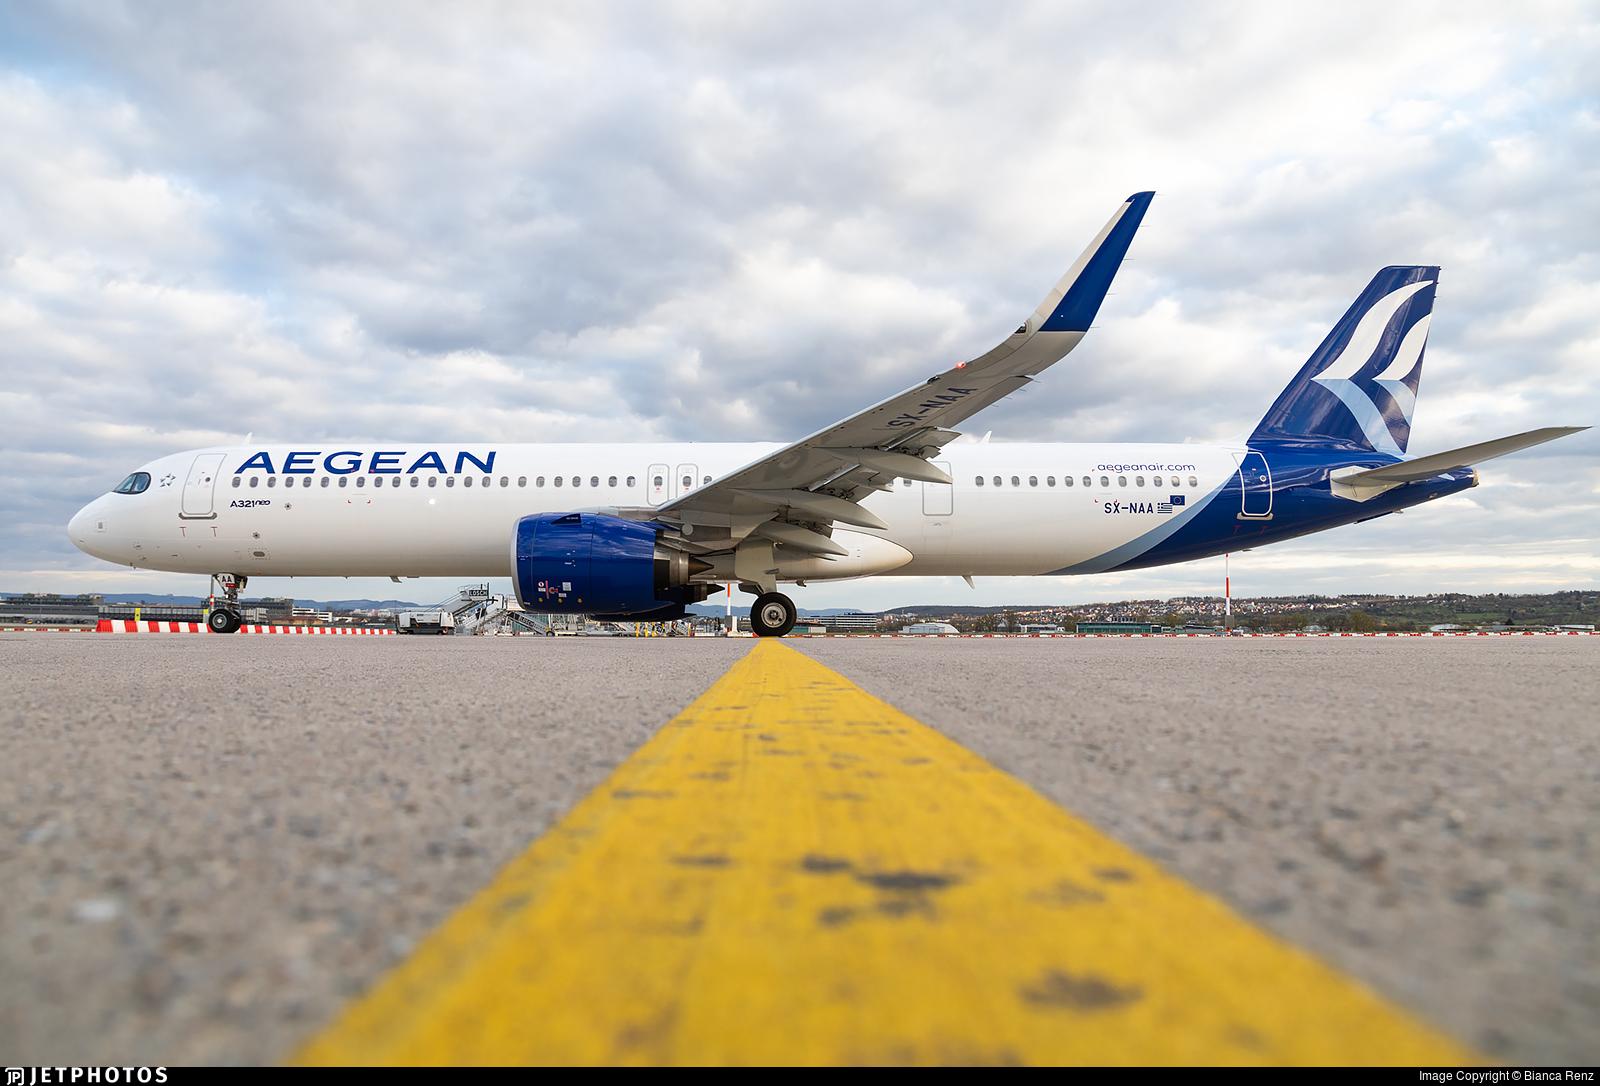 SX-NAA - Airbus A321-271NX - Aegean Airlines